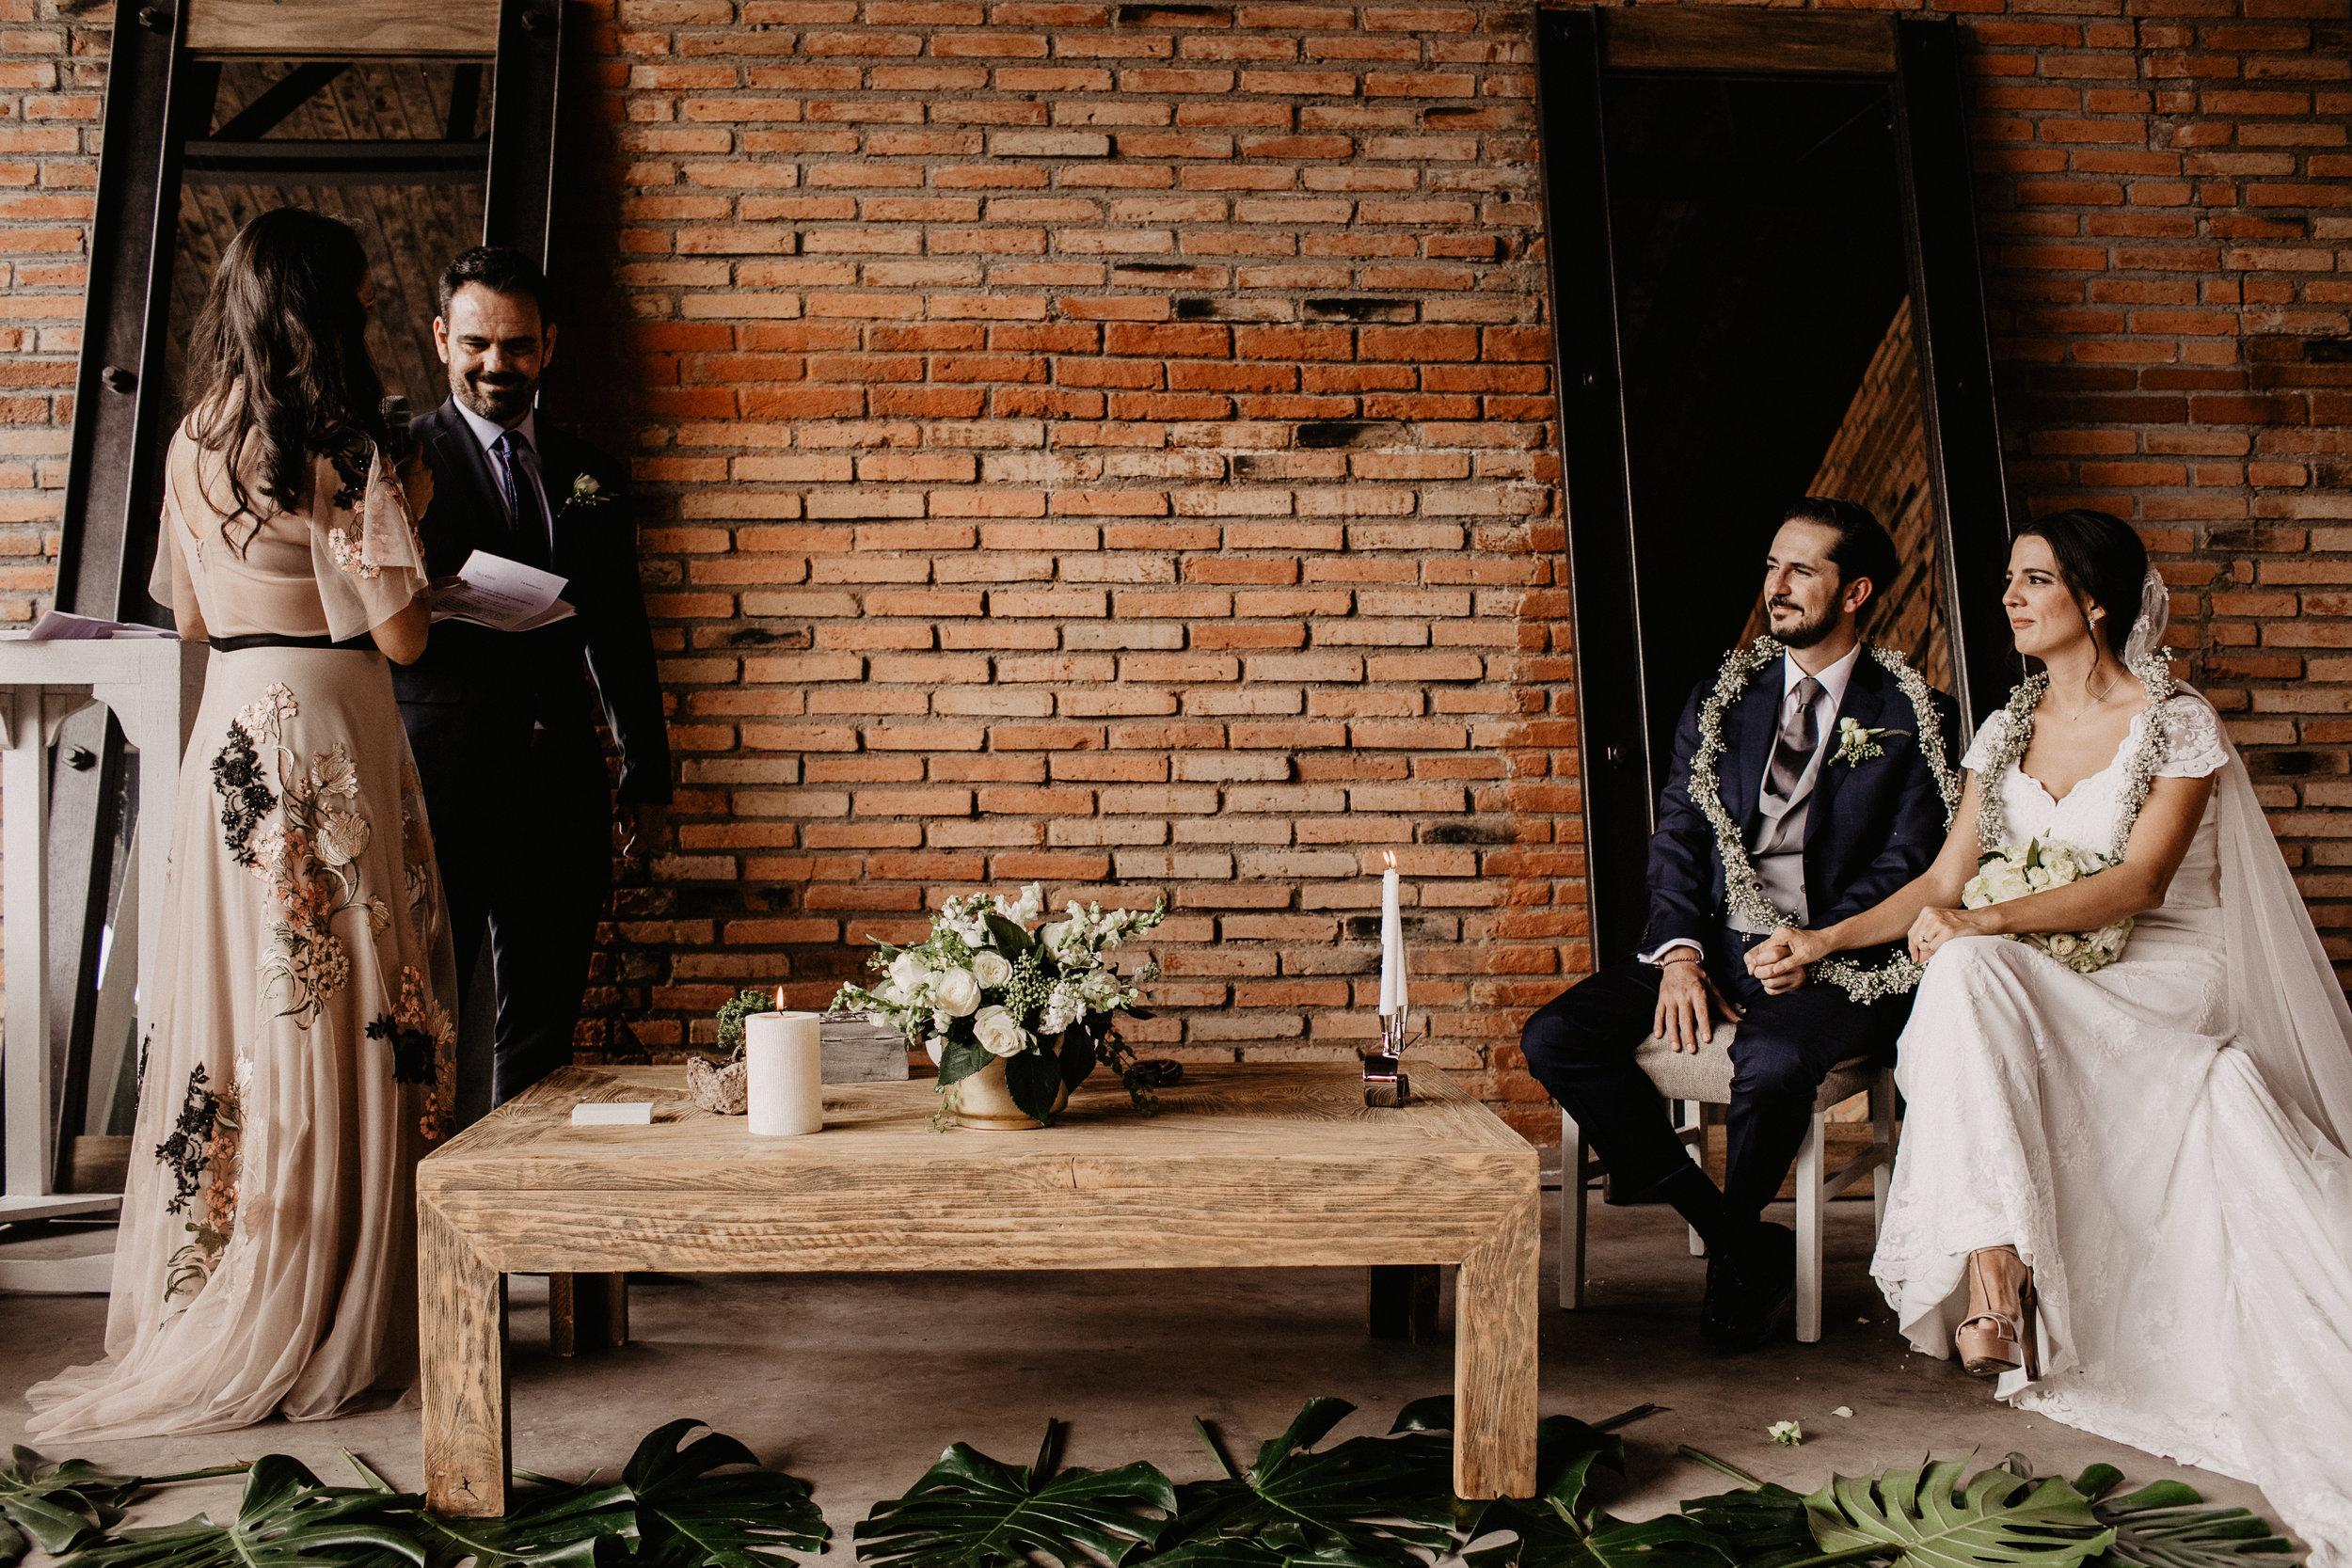 alfonso_flores_destination_wedding_photographer_pau_alonso_599.JPG